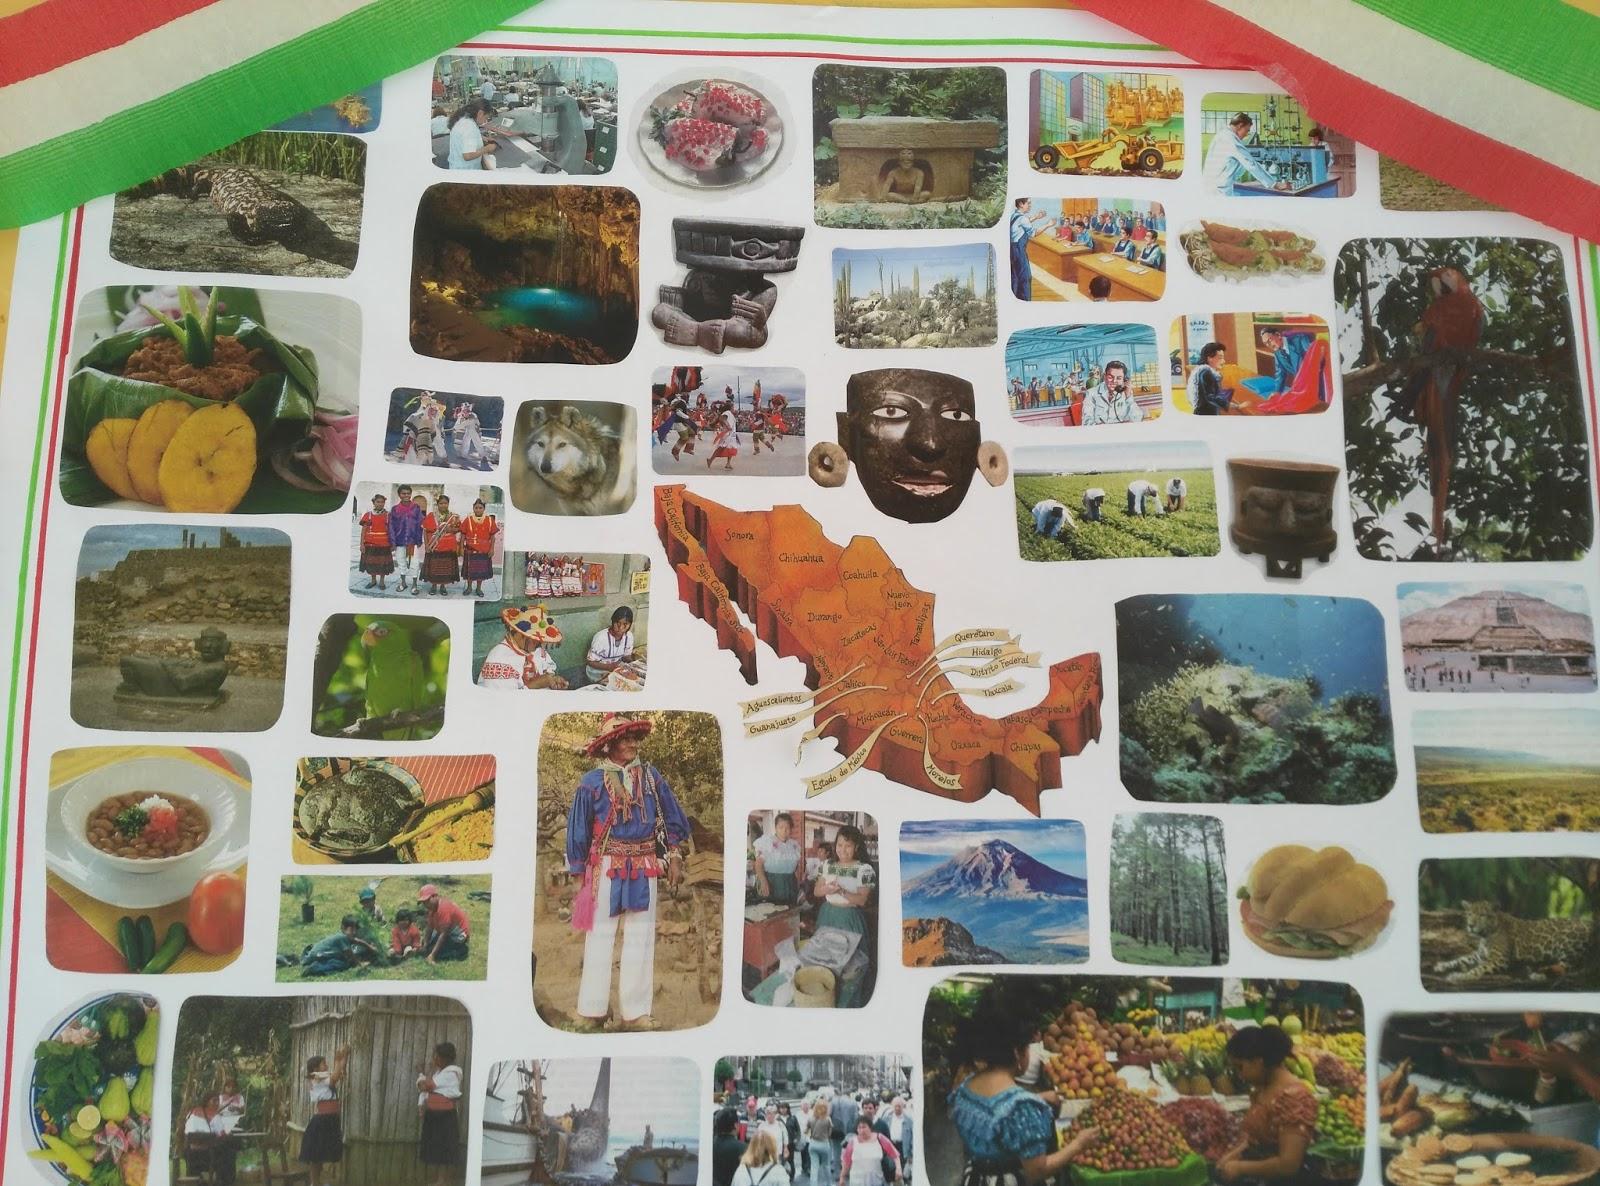 El blog de historia de los alumnos de la secundaria 231 for Caracteristicas de un mural